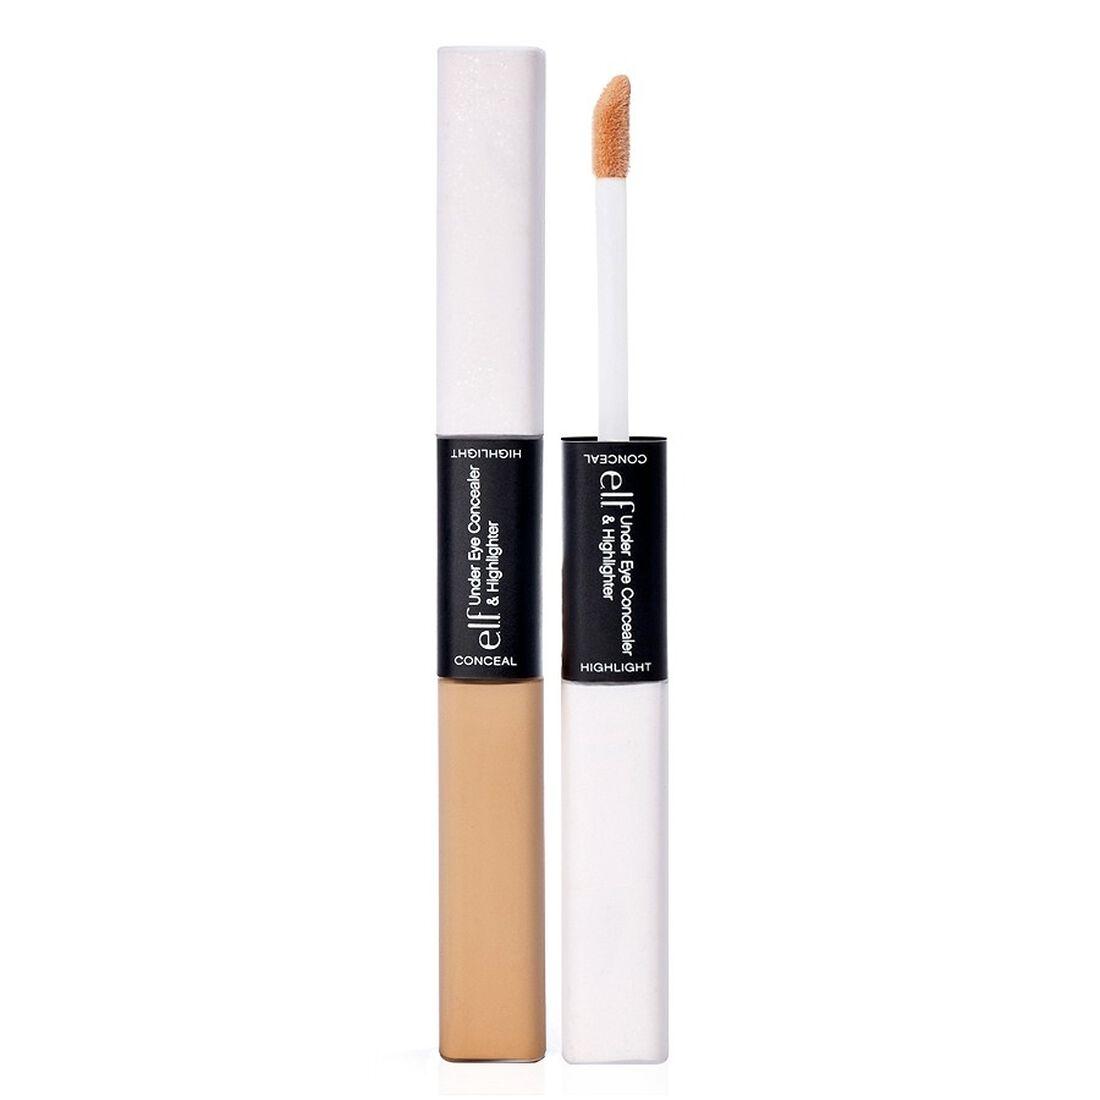 E.l.f Cosmetics - Under Eye Concealer & Highlighter